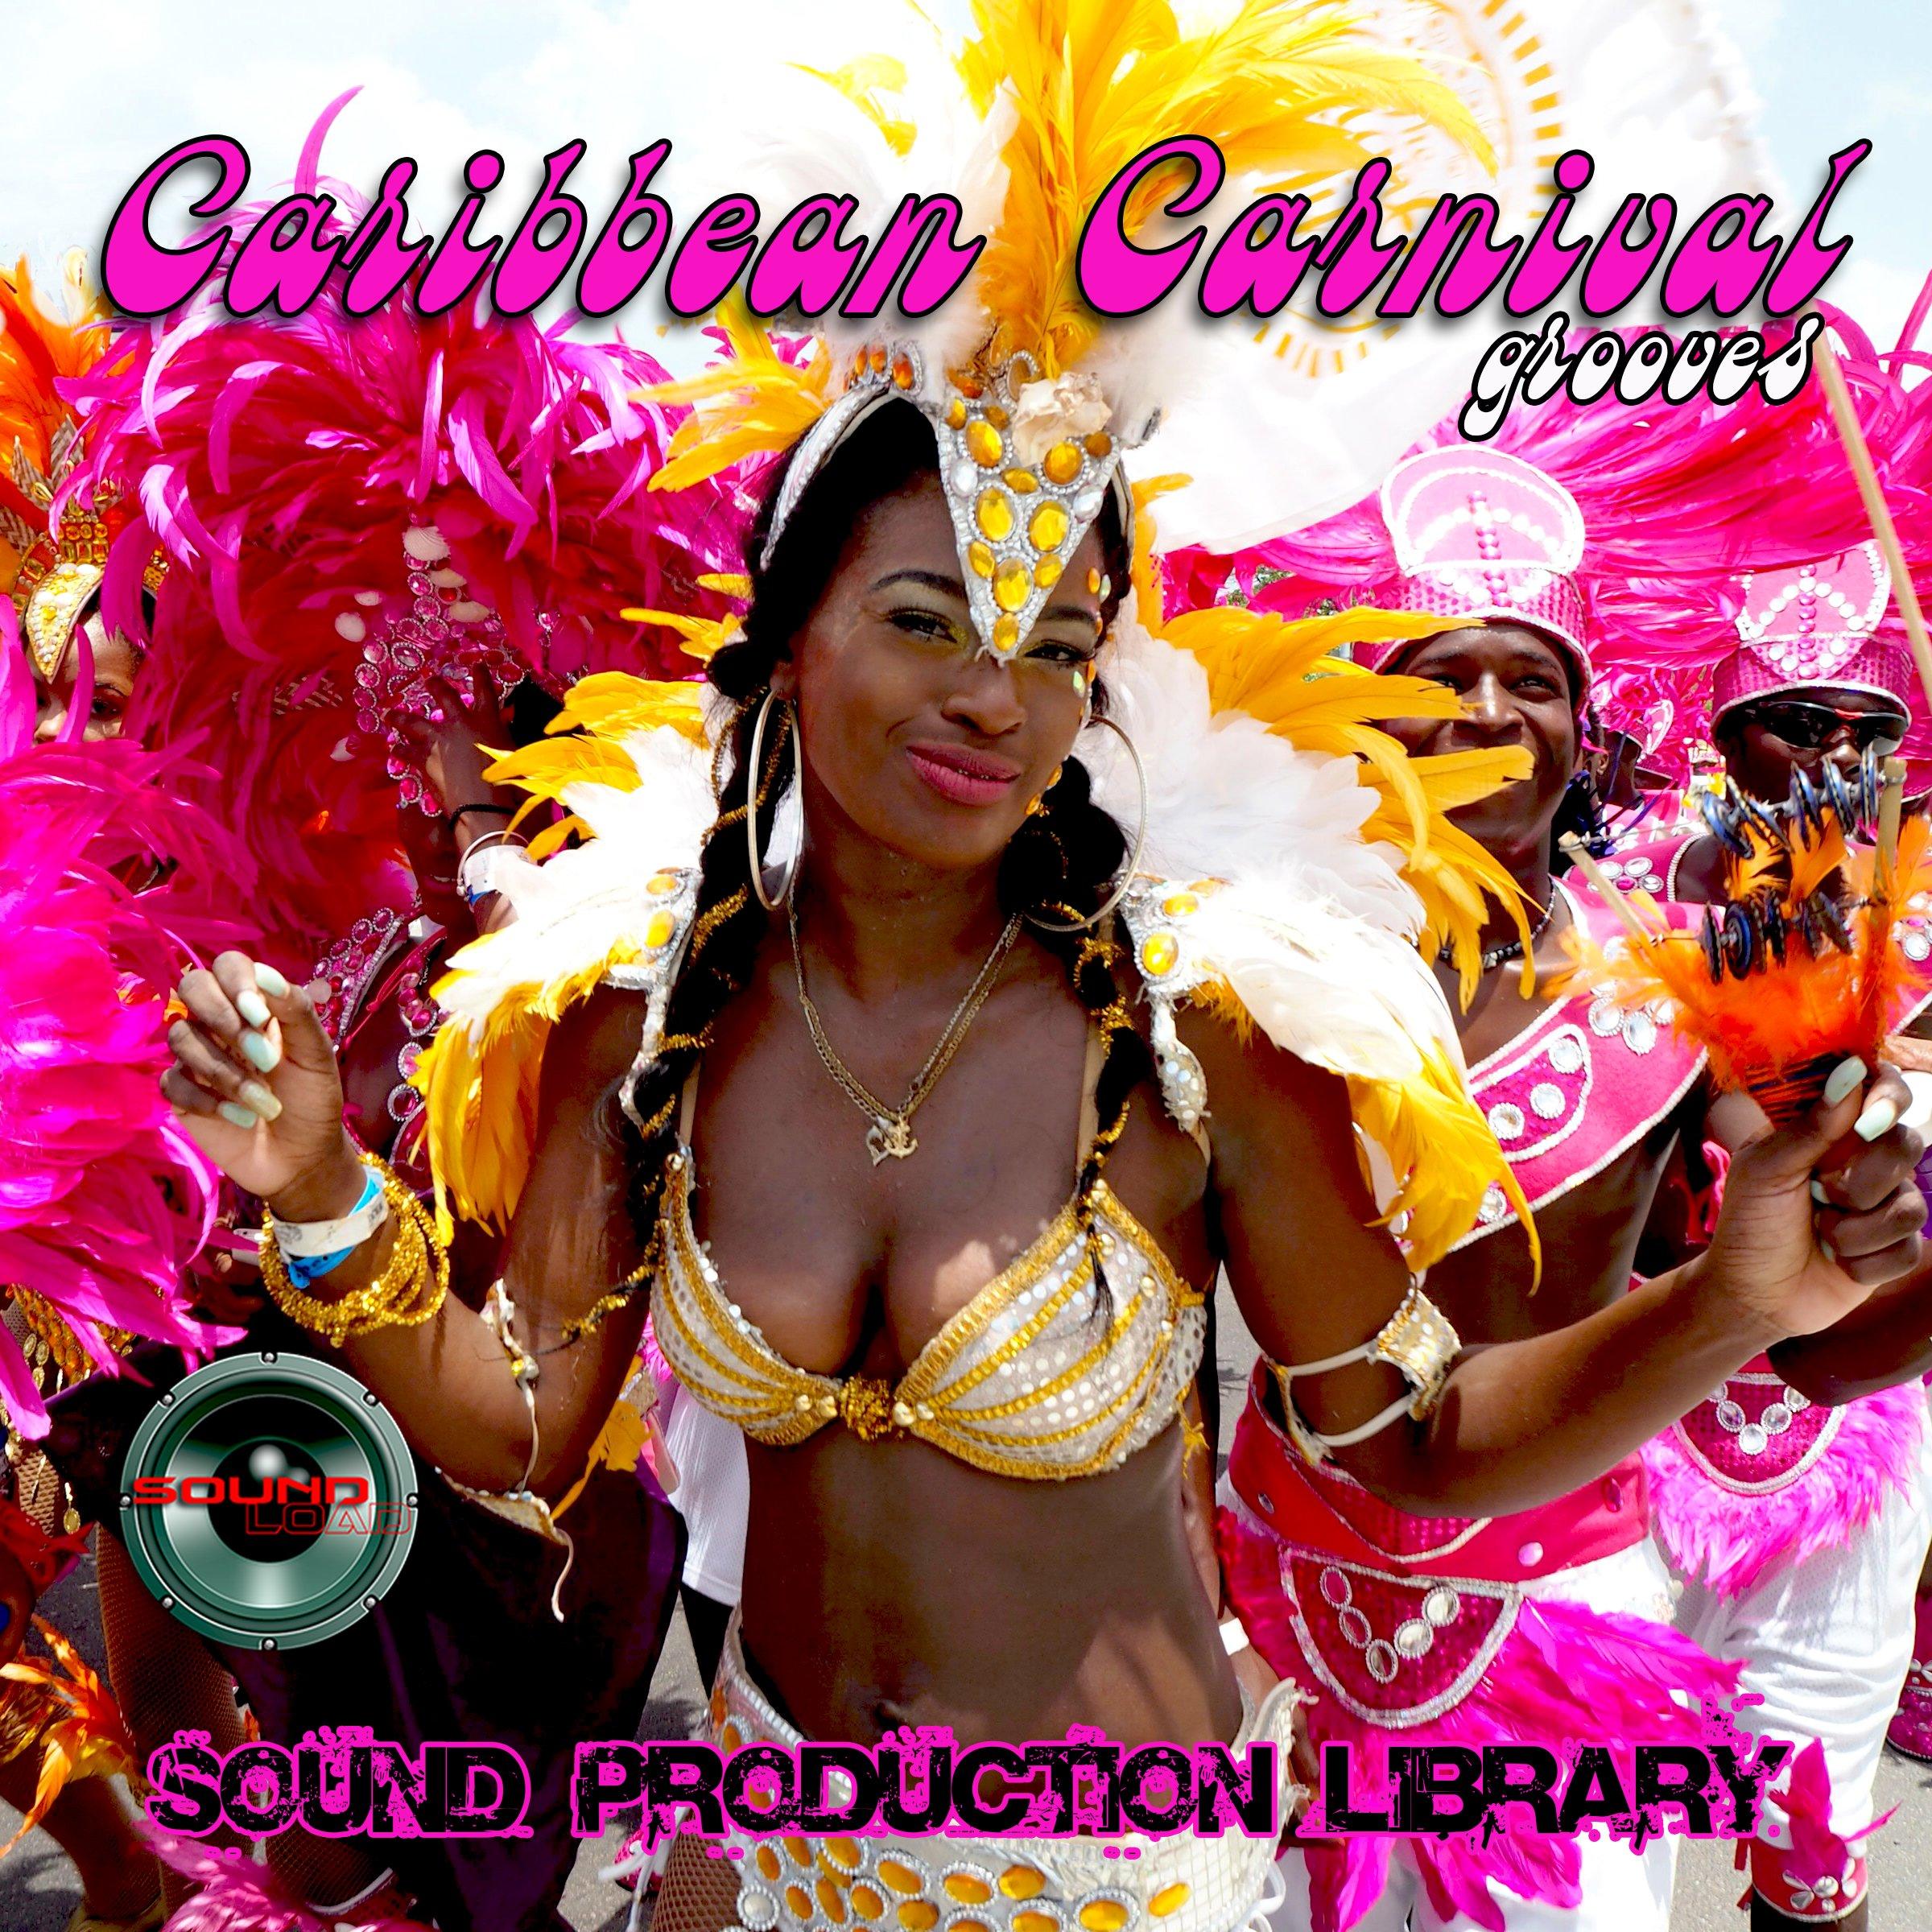 Caribbean Carnival Grooves - Large unique original WAVE/Kontakt Multi-Layer Samples Library on 2 DVD or download by SoundLoad